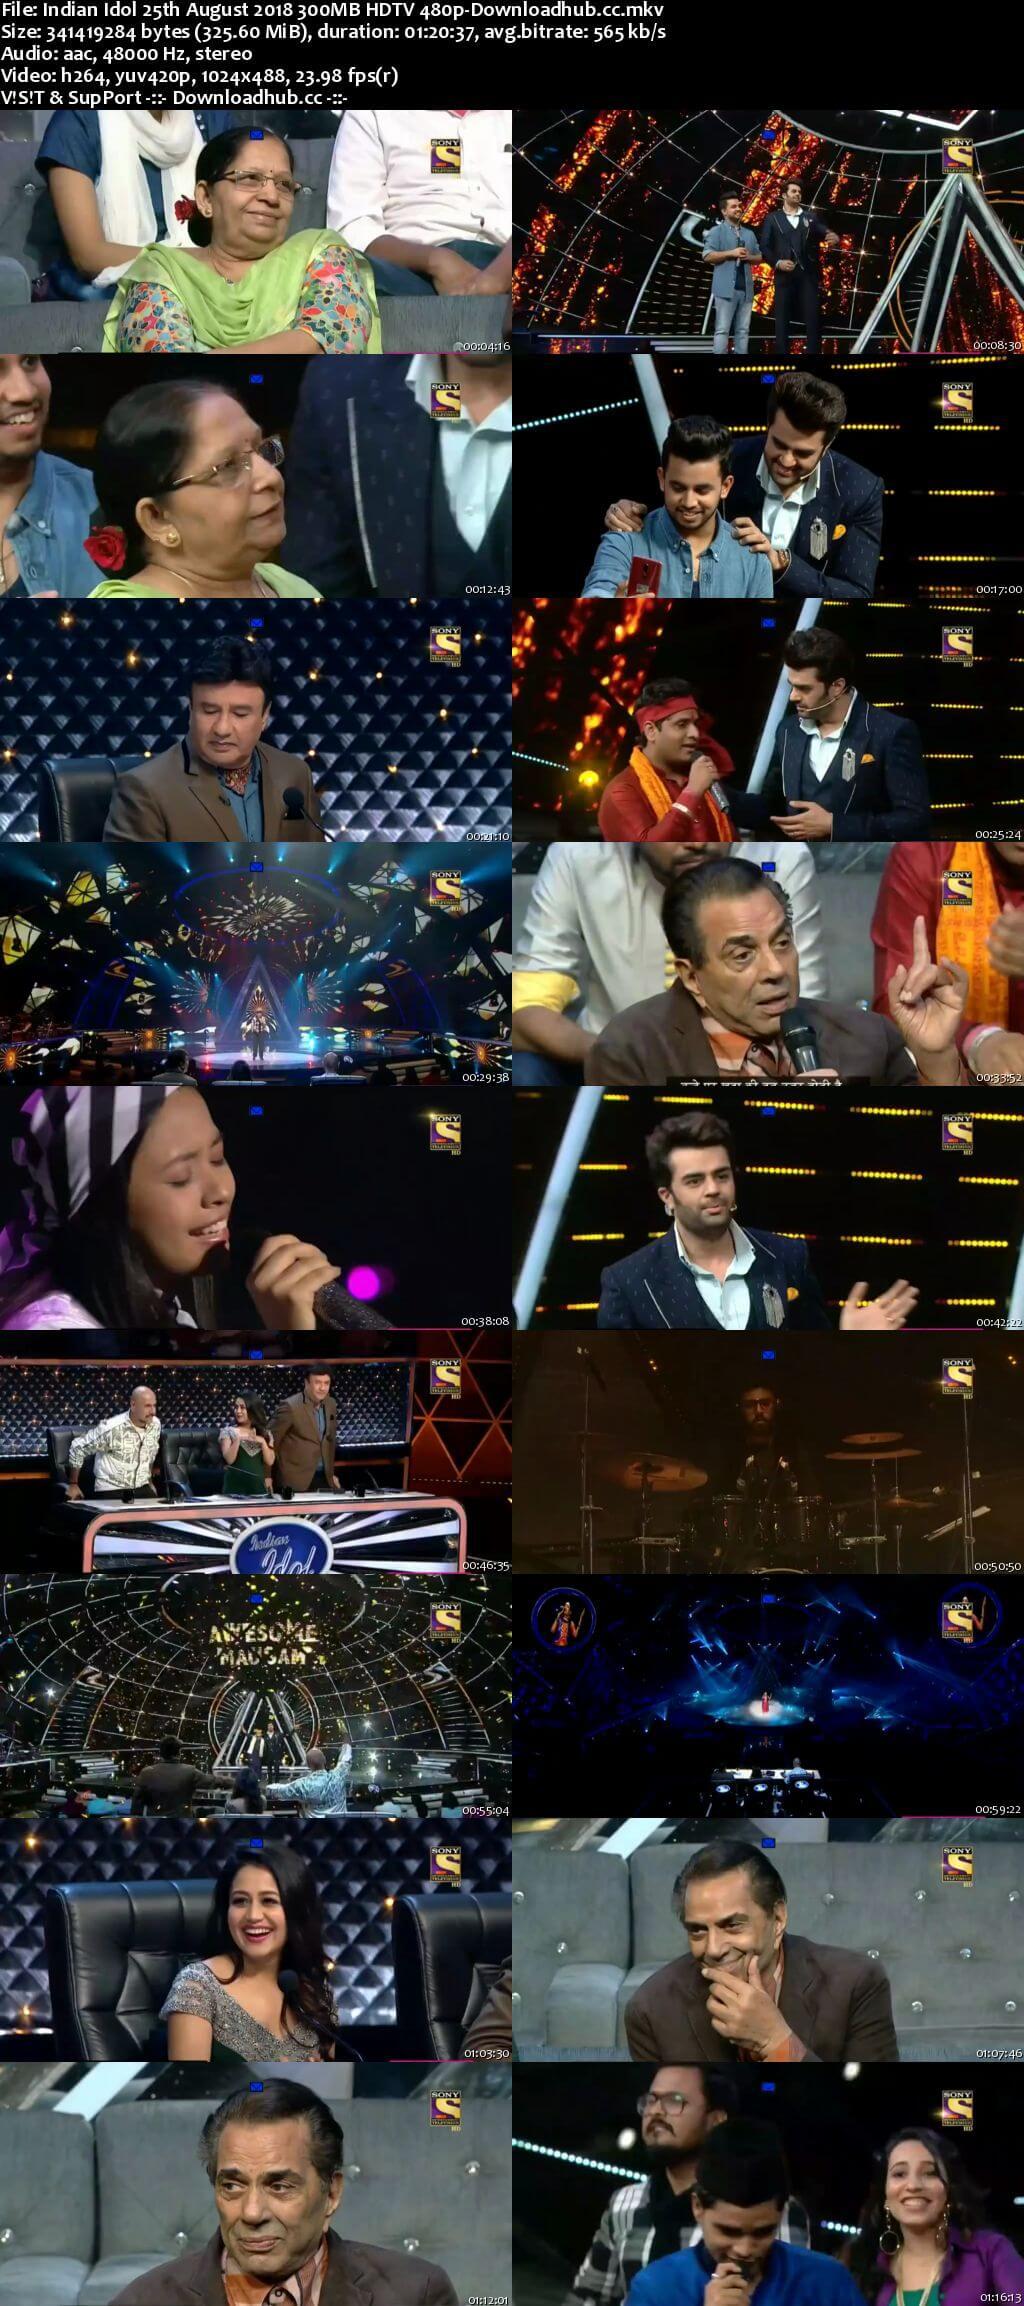 Indian Idol 25 August 2018 Episode 15 HDTV 480p